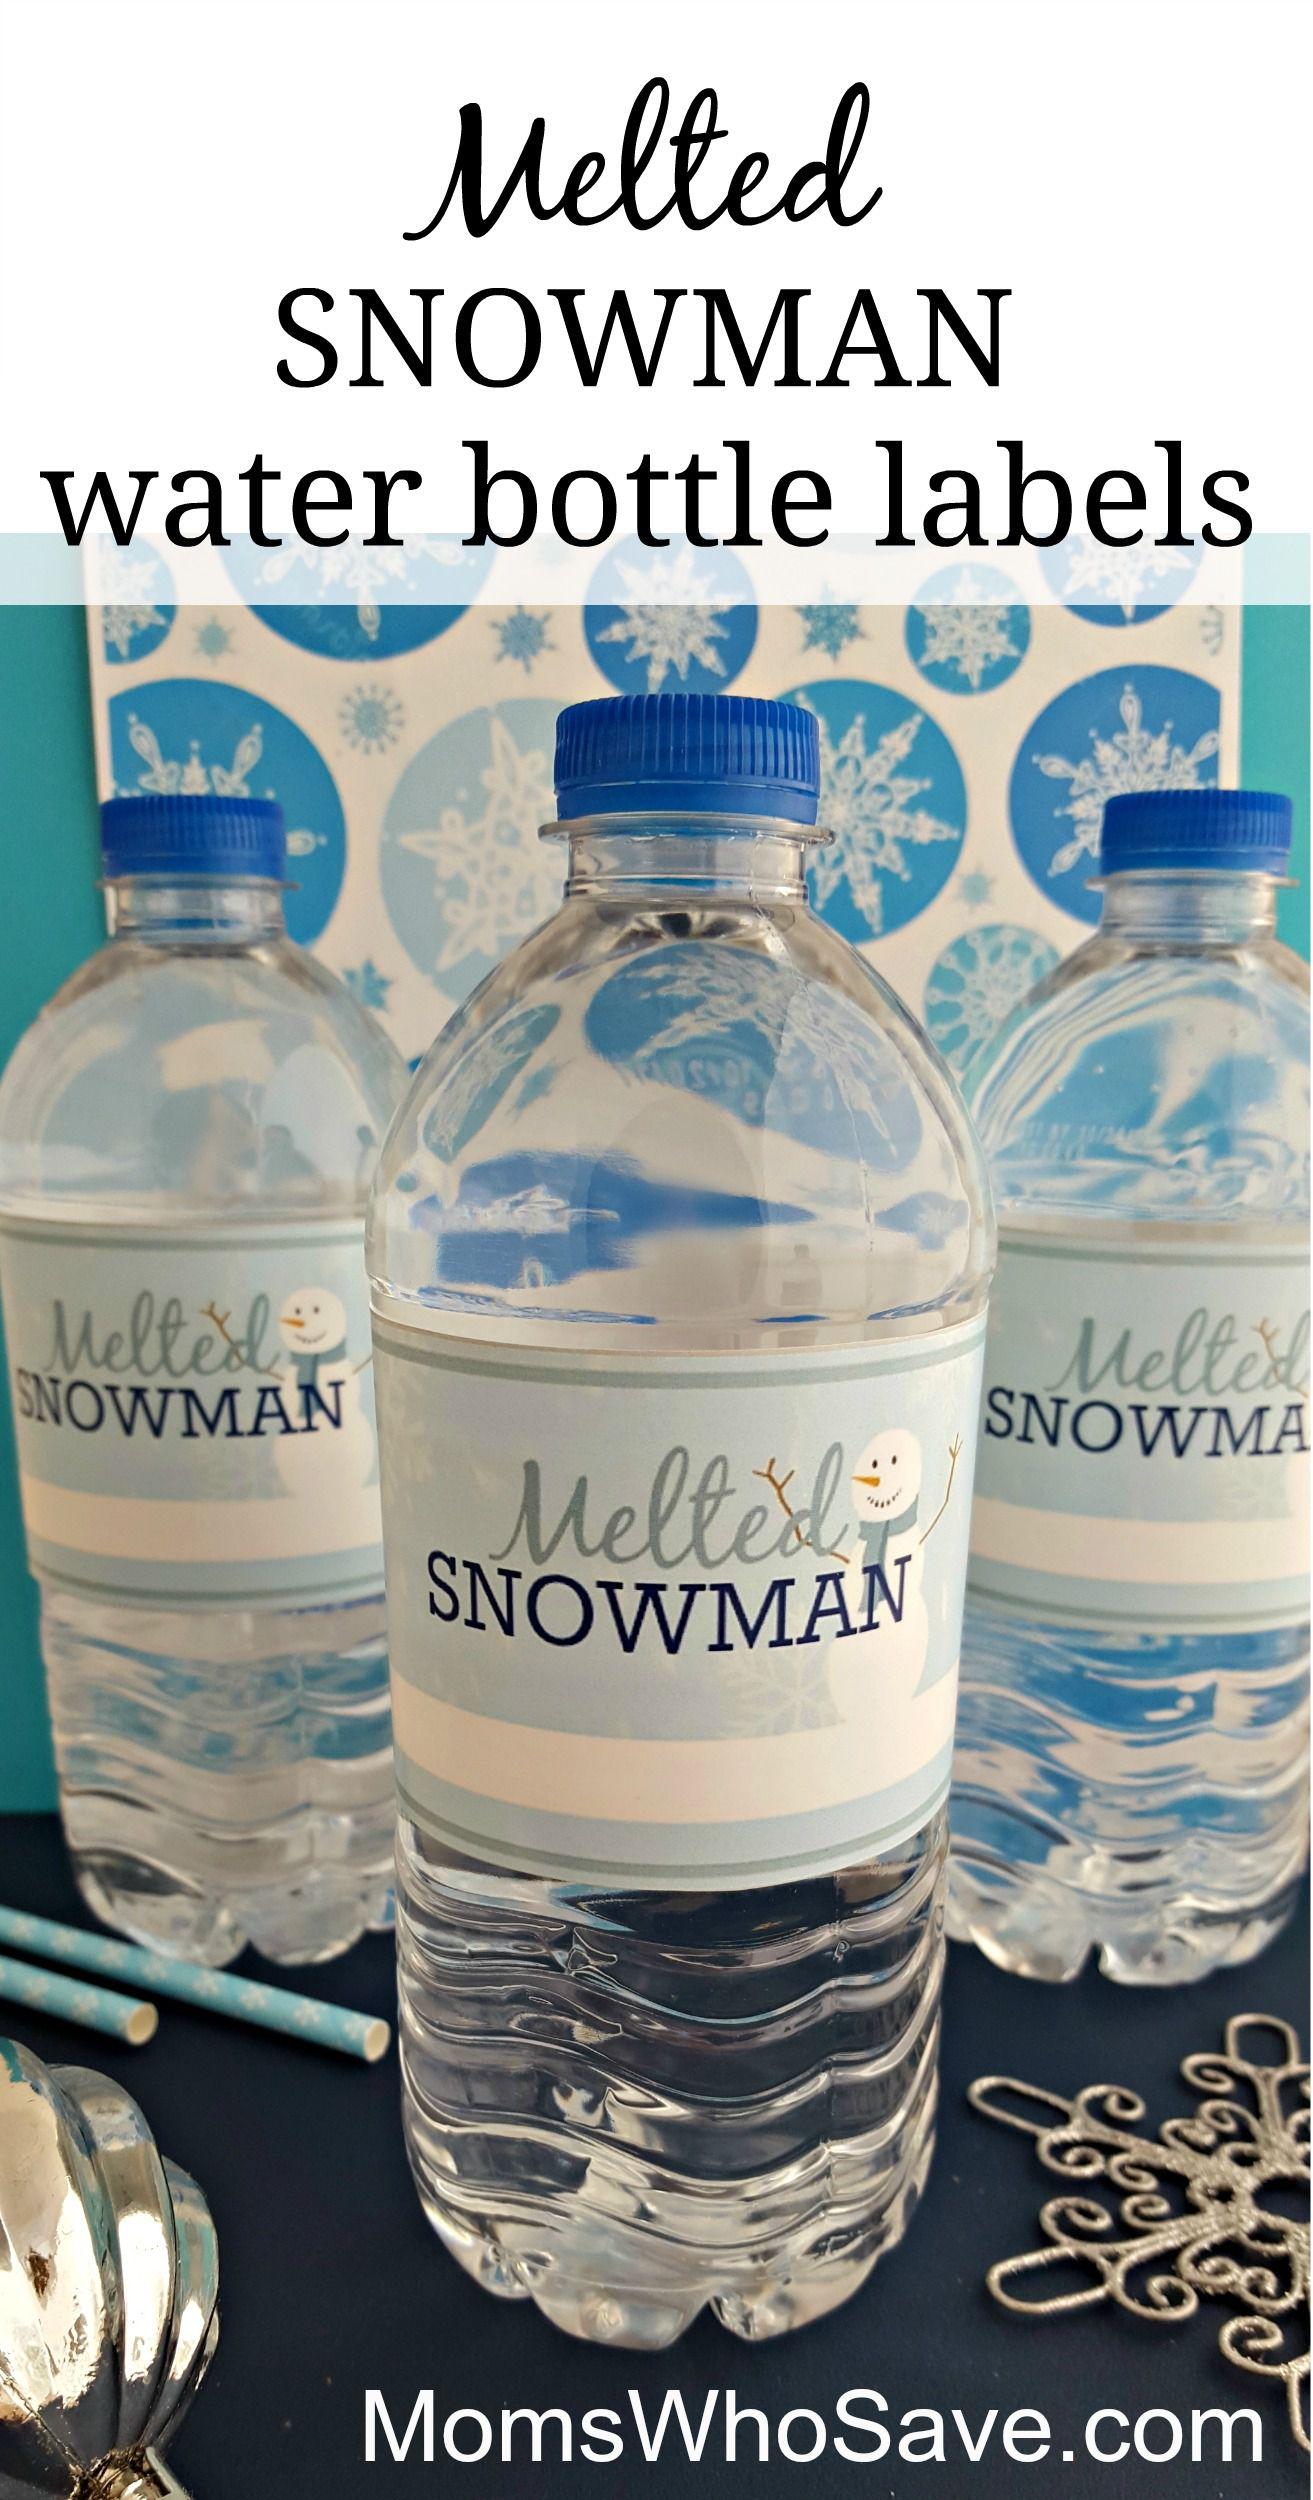 008 Wondrou Diy Water Bottle Label Template Free Inspiration Full